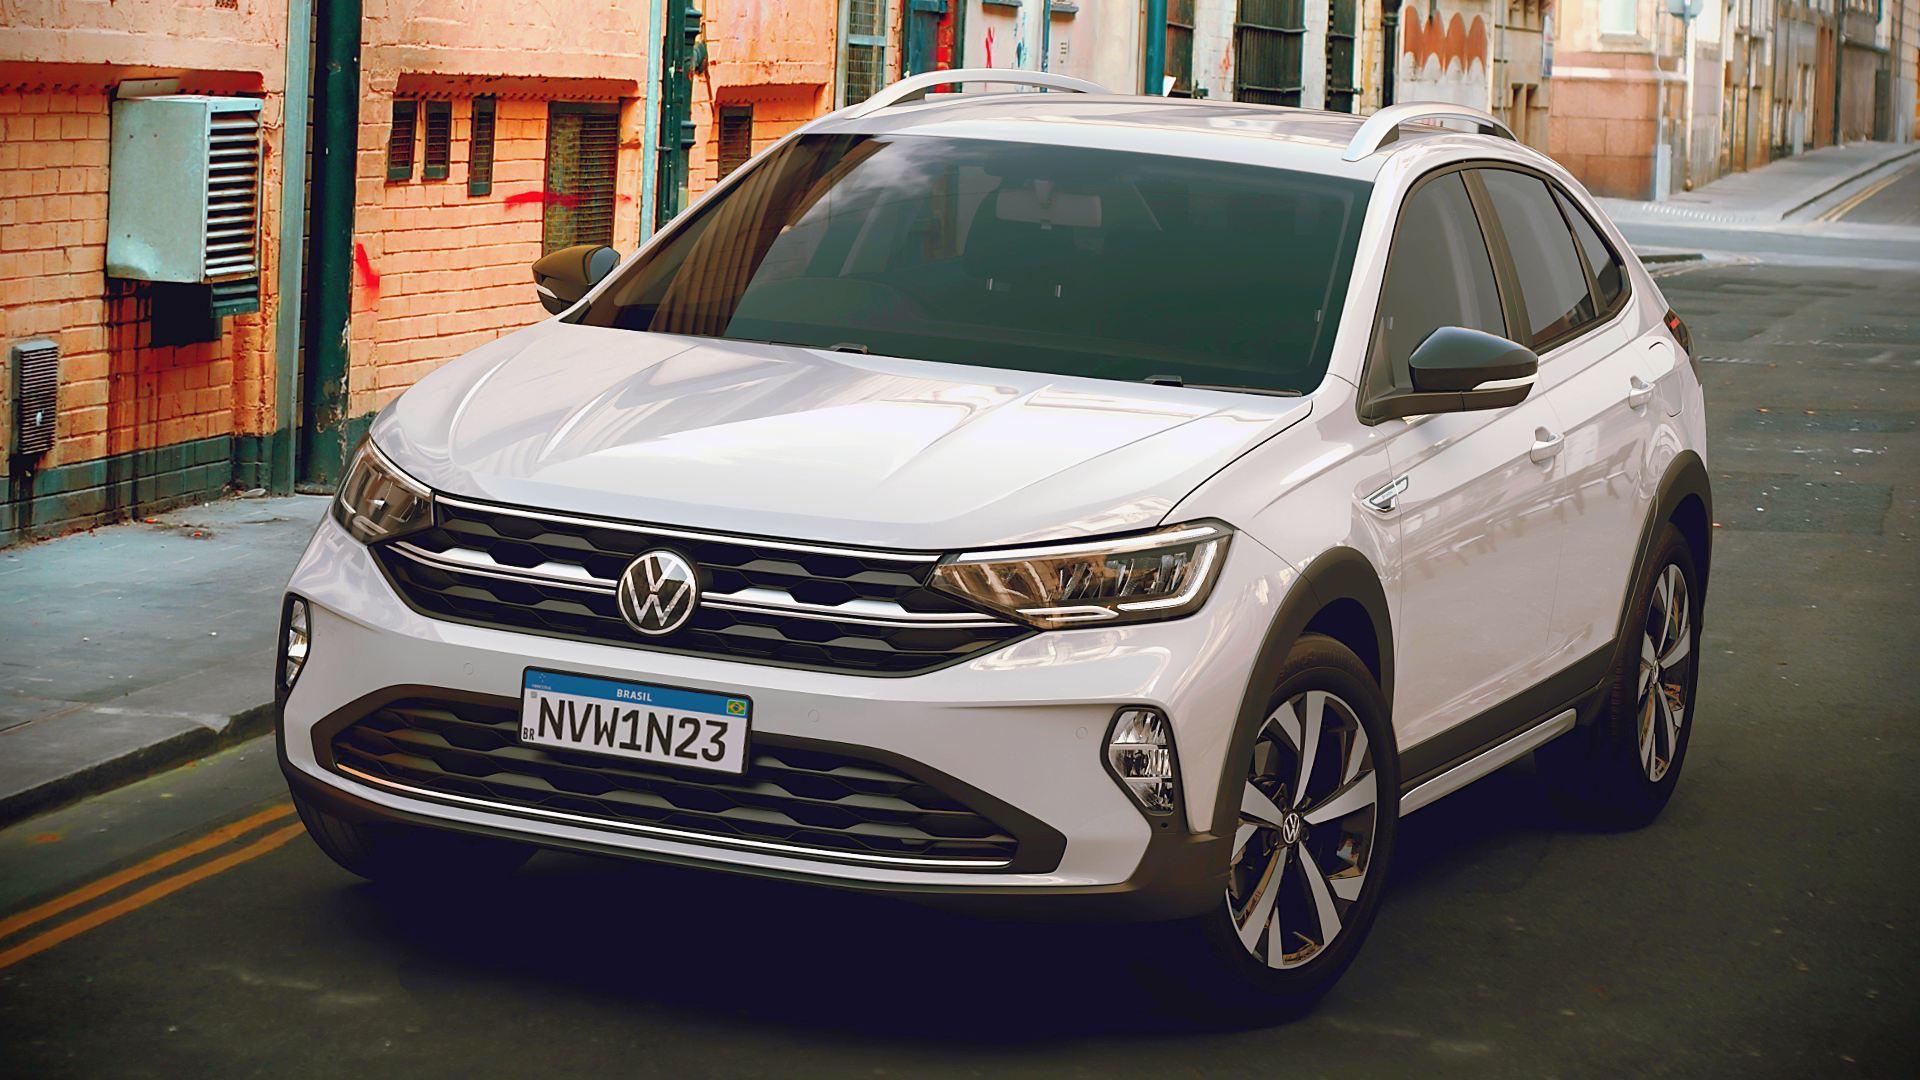 2021 Volkswagen Nivus White SUV Images